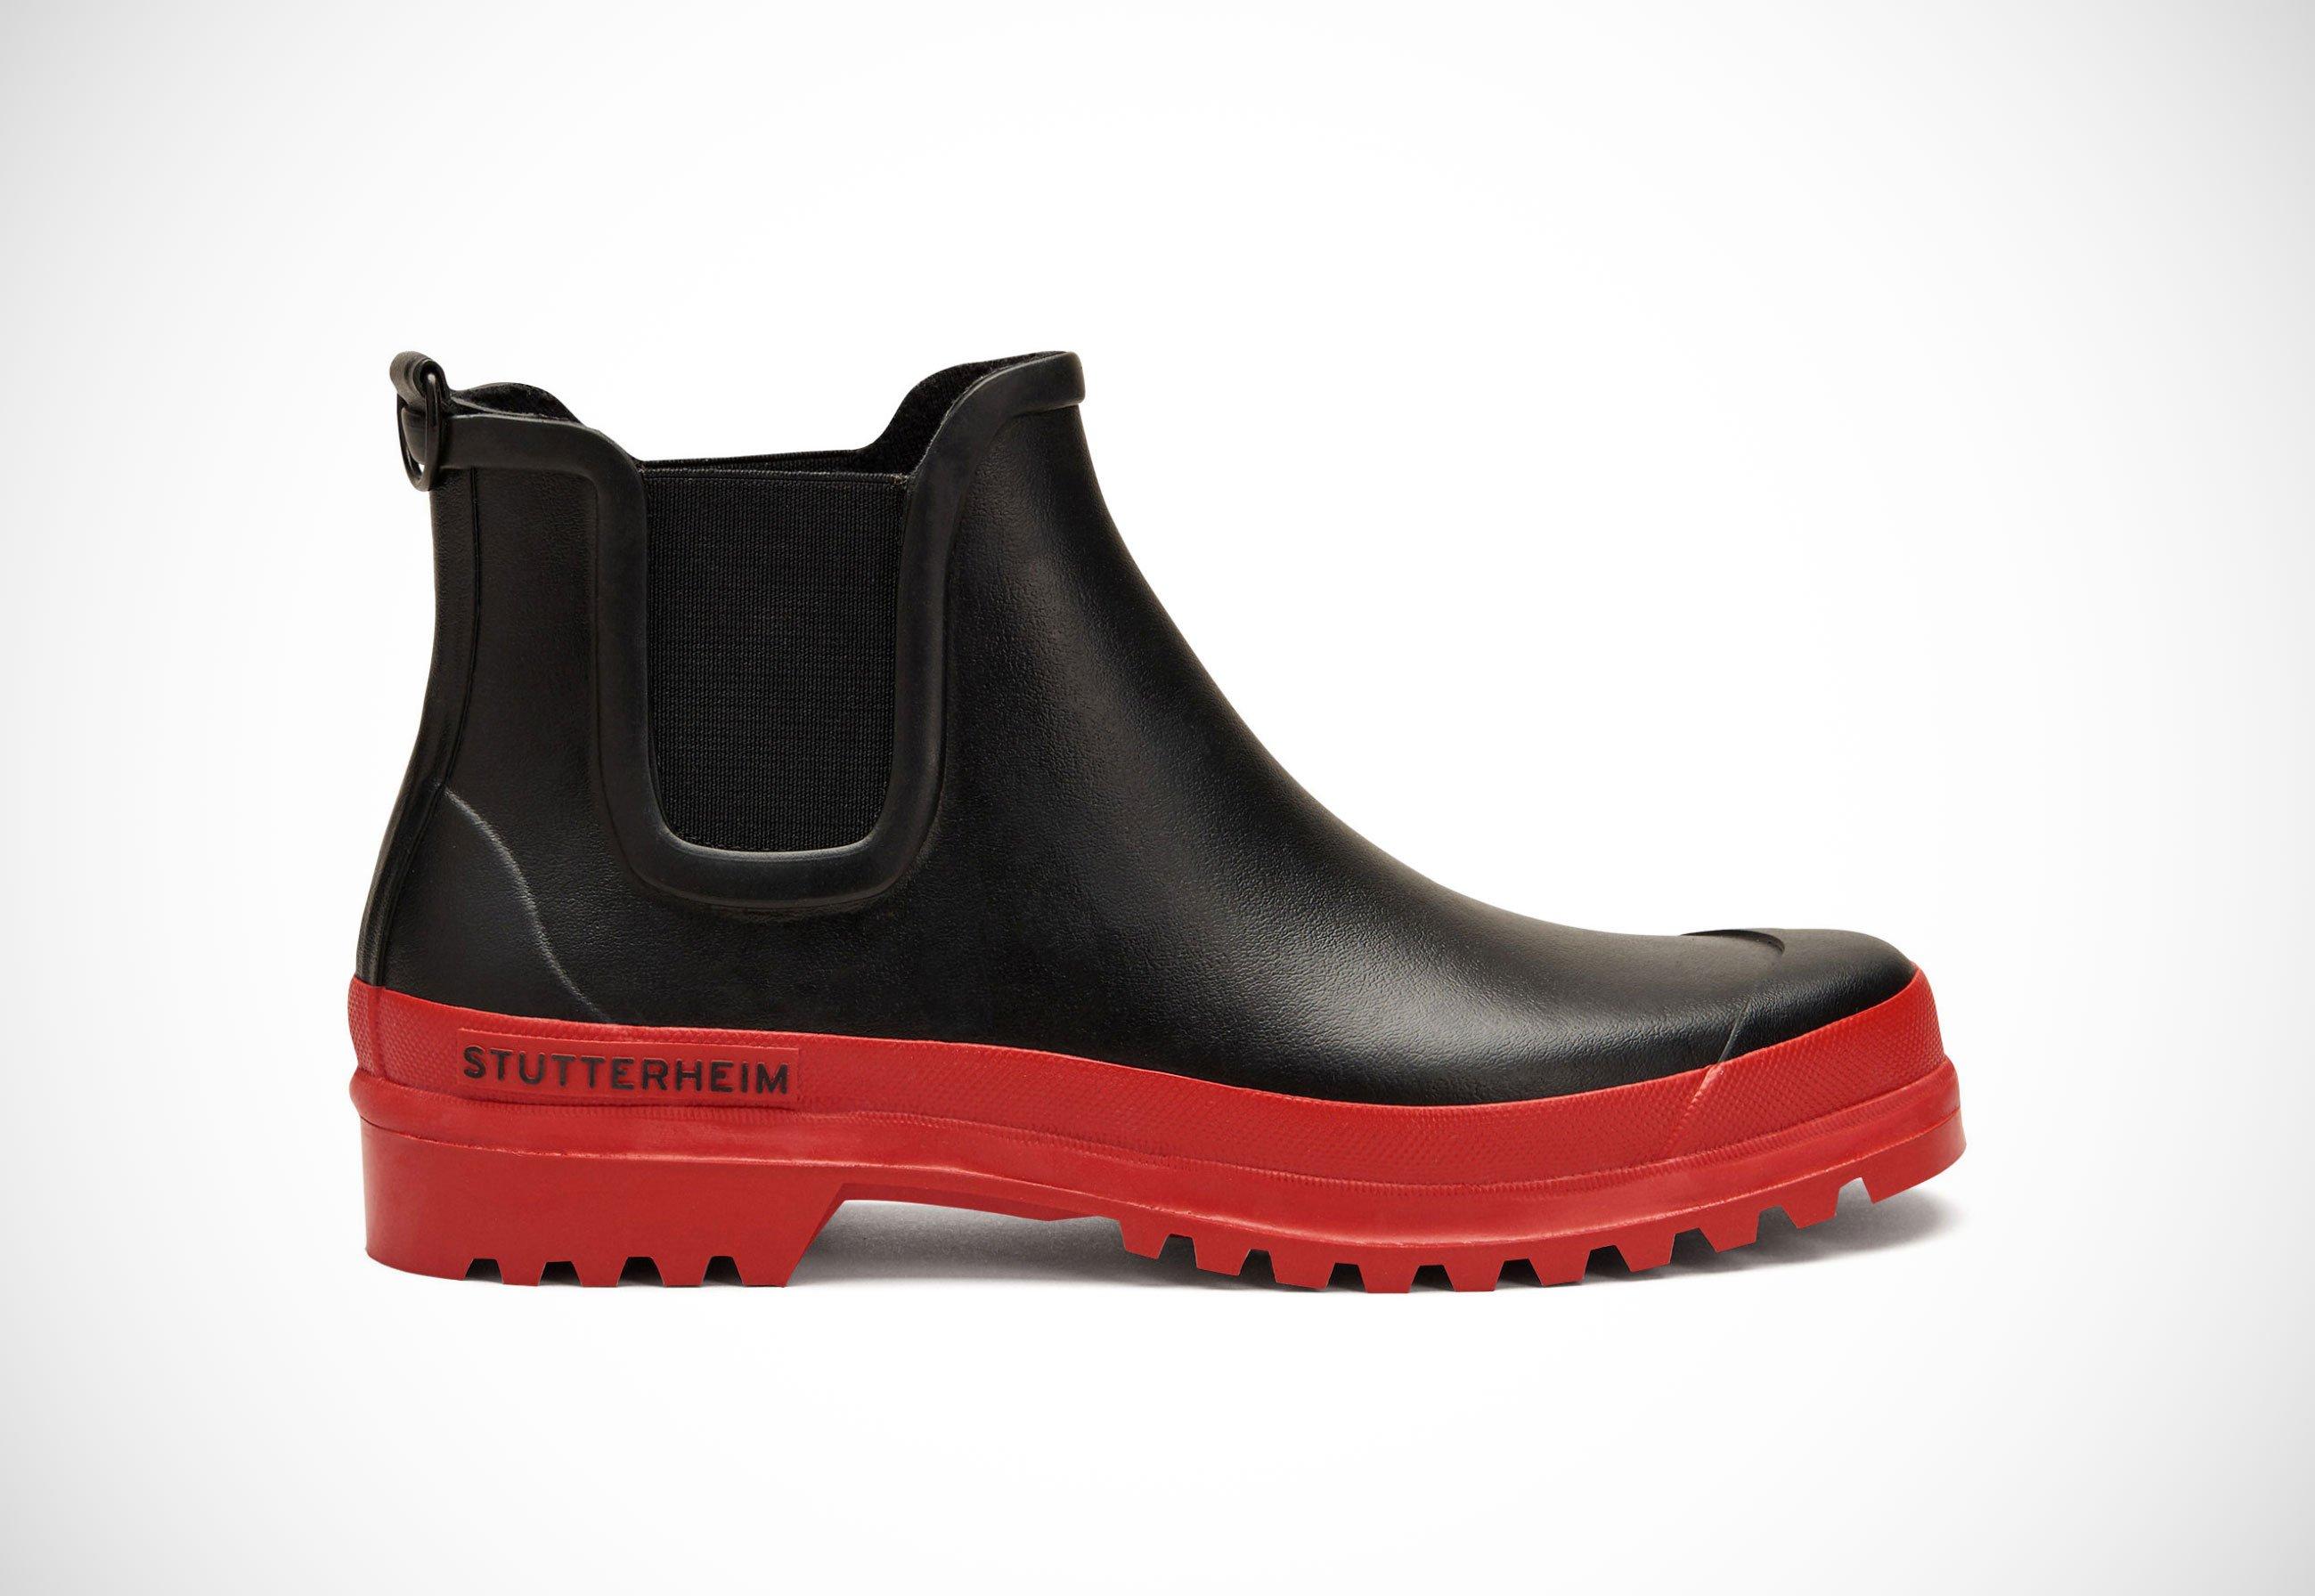 Stutterheim chelsea rainwalker boot the limited edition chelsea rainwalker boot will be available in stutterheims online shop the brands stockholm and new york flagship stores will also solutioingenieria Images